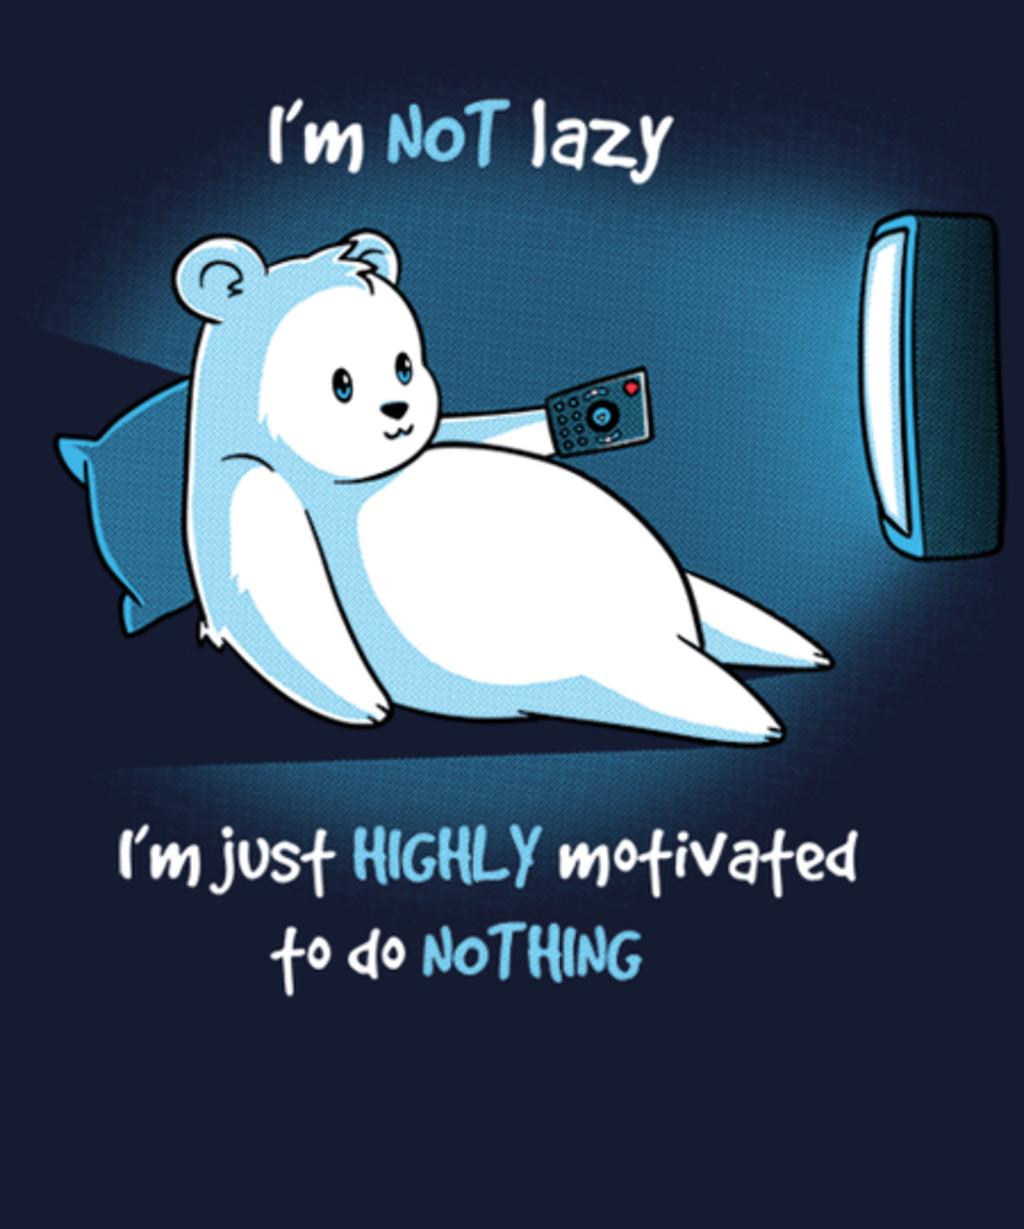 Qwertee: I'm Not Lazy